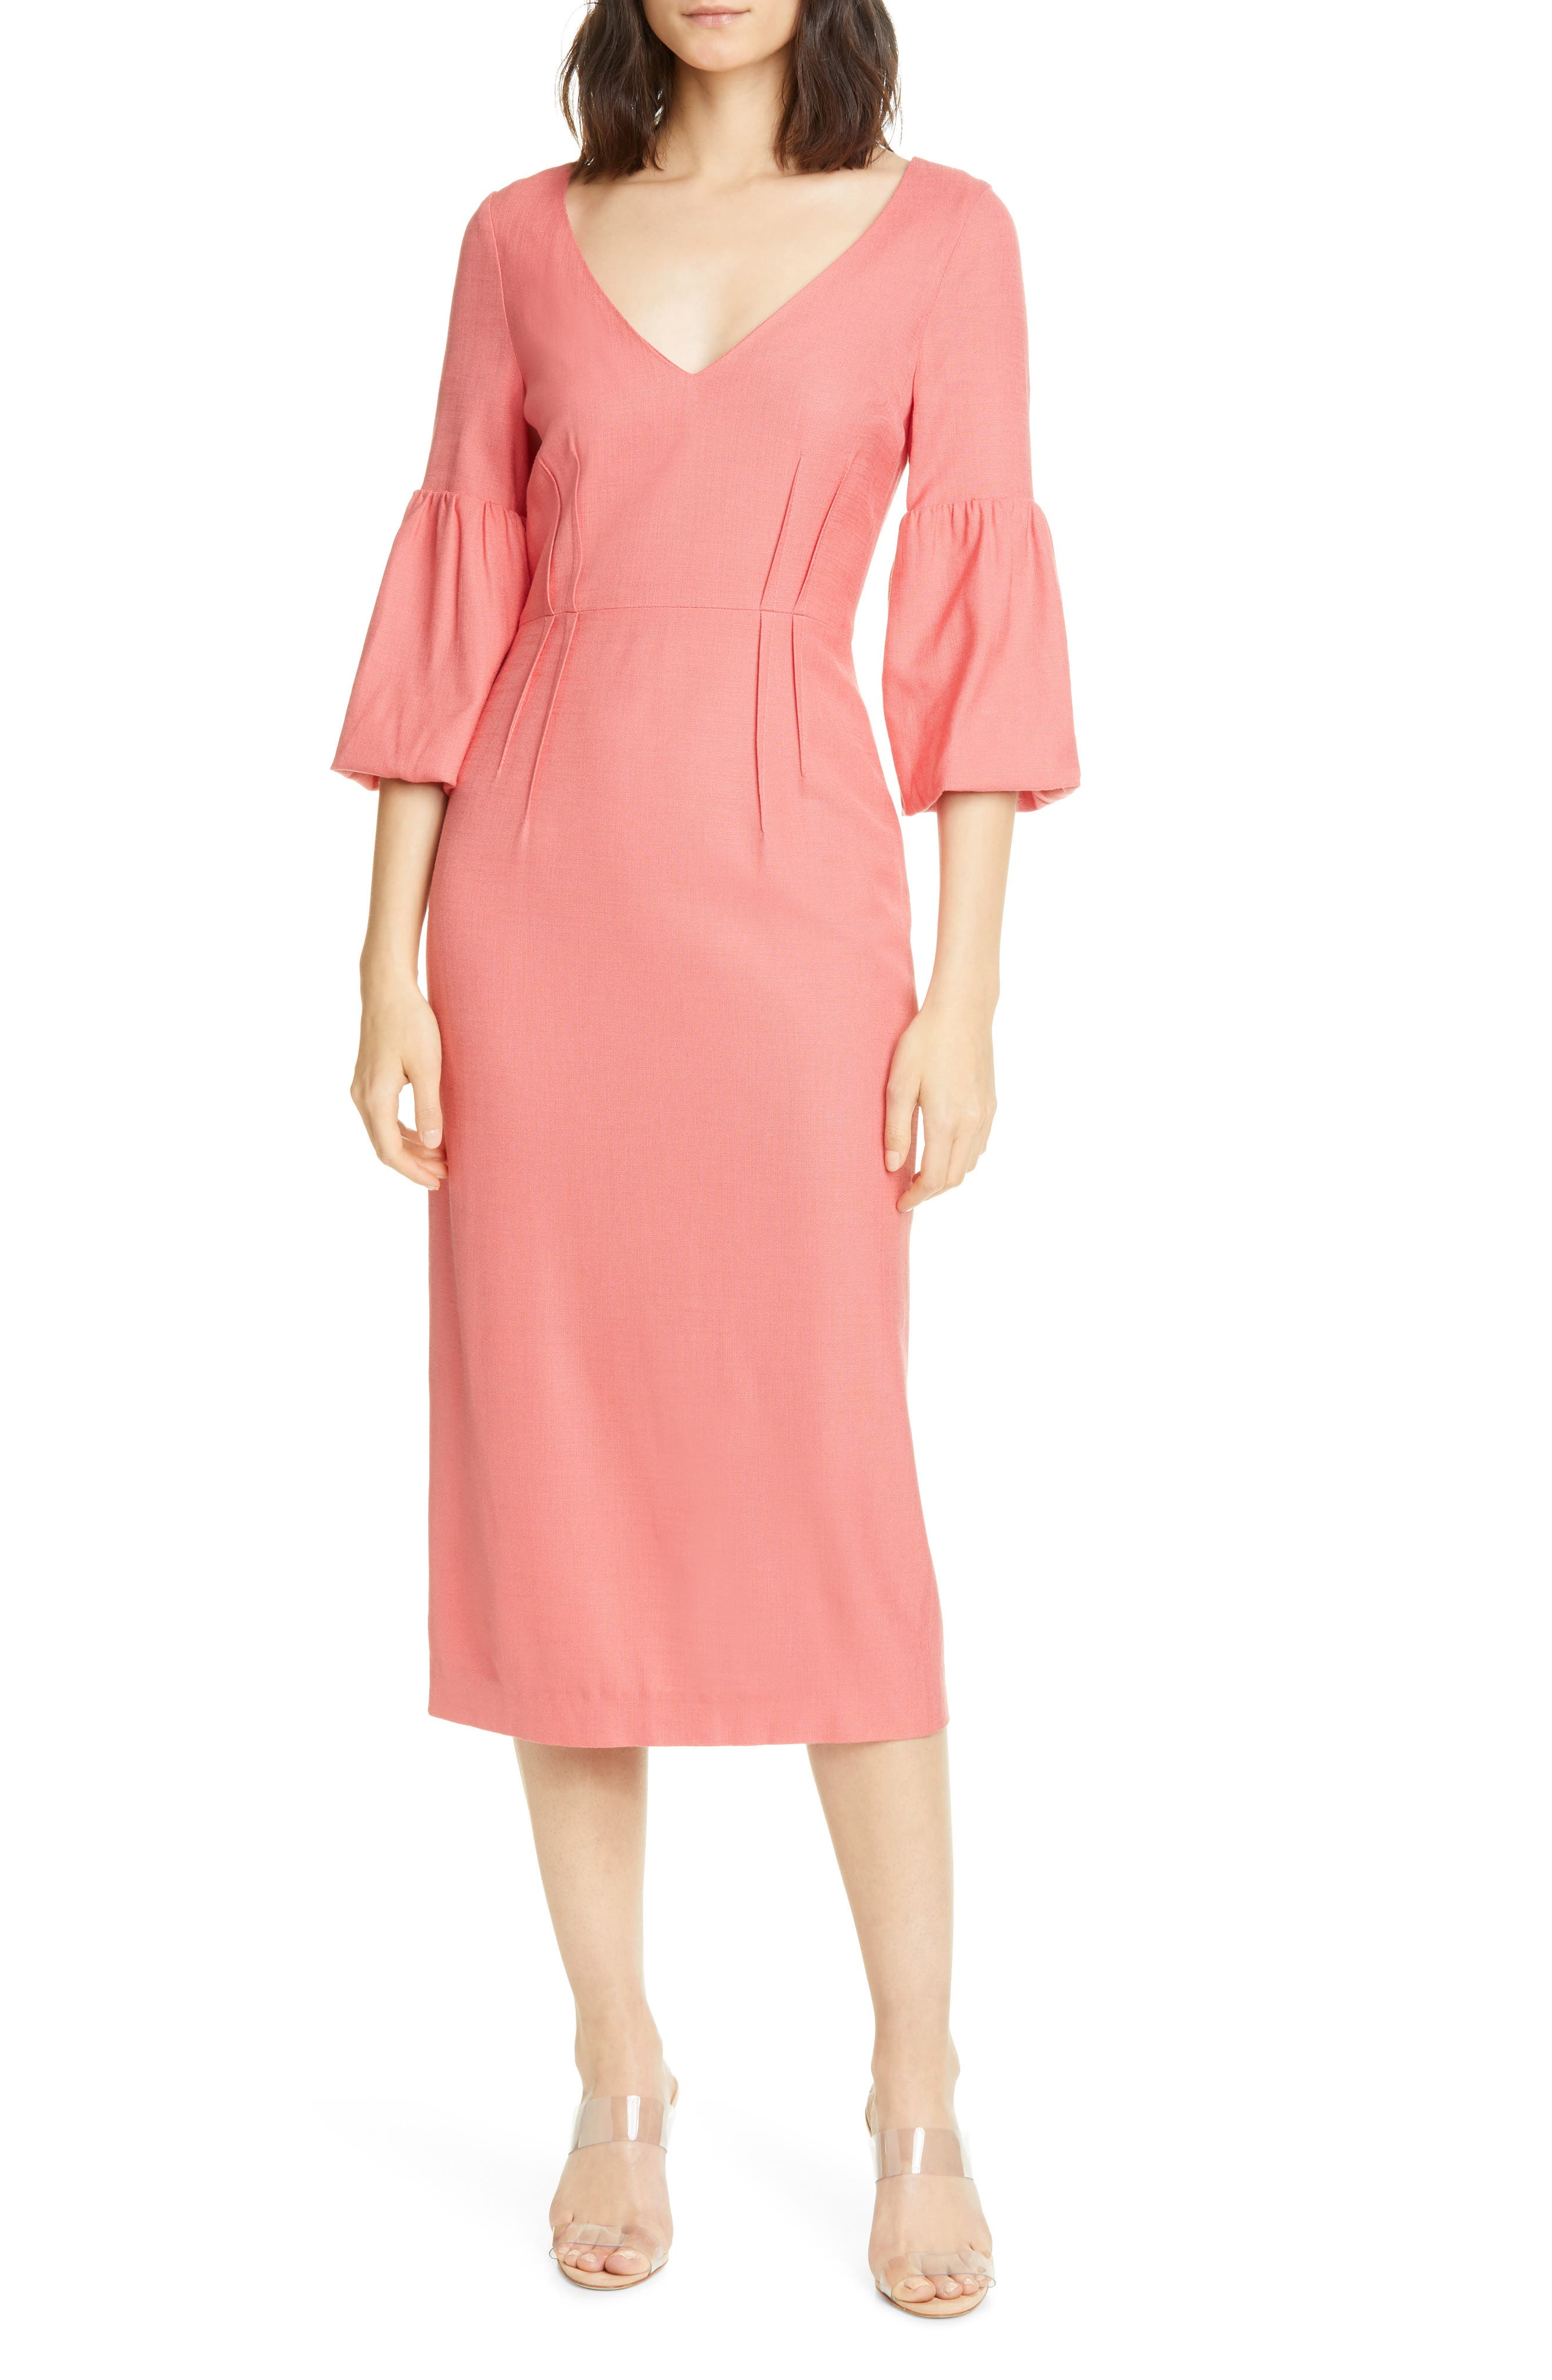 Image of VERONICA BEARD Amalita Midi Dress